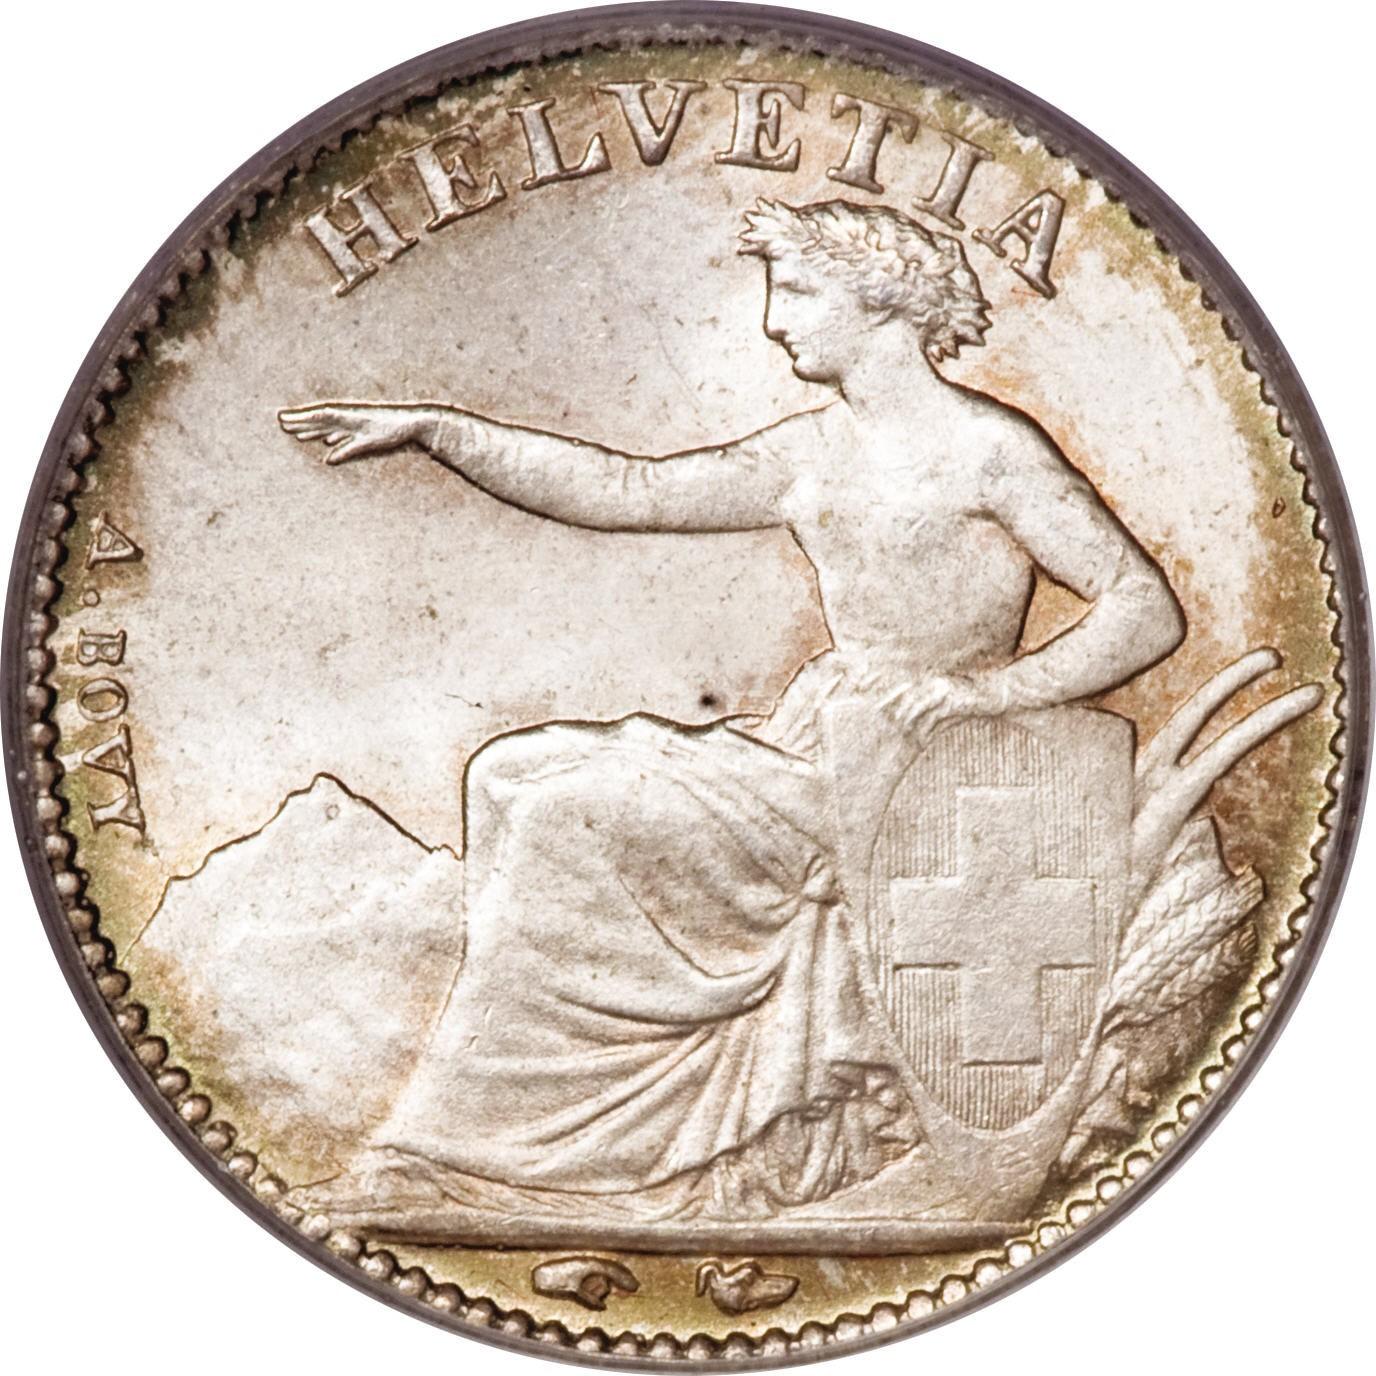 Switzerland ½ Franc (1850-1851)